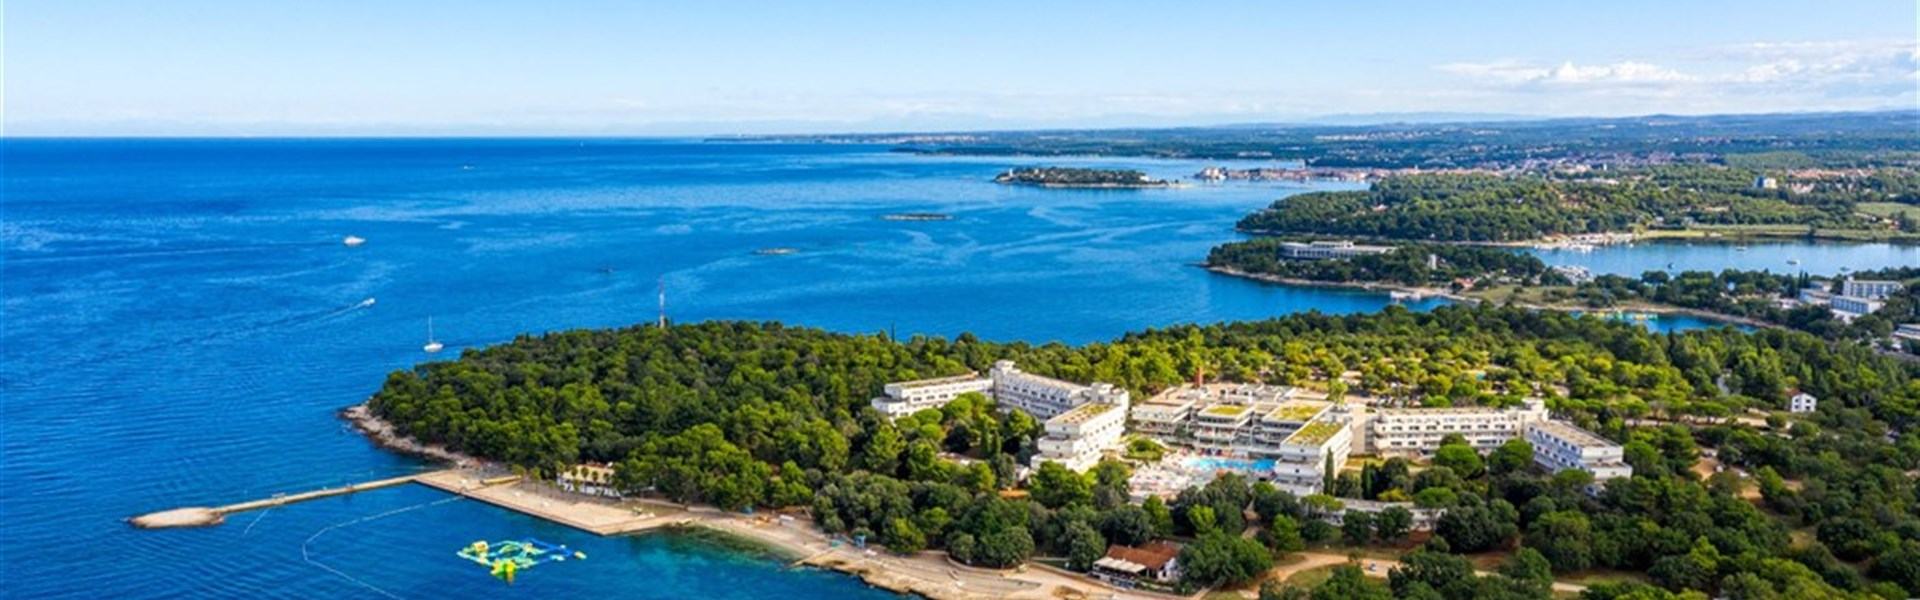 Marco Polo - Hotel Delfin Plava Laguna -